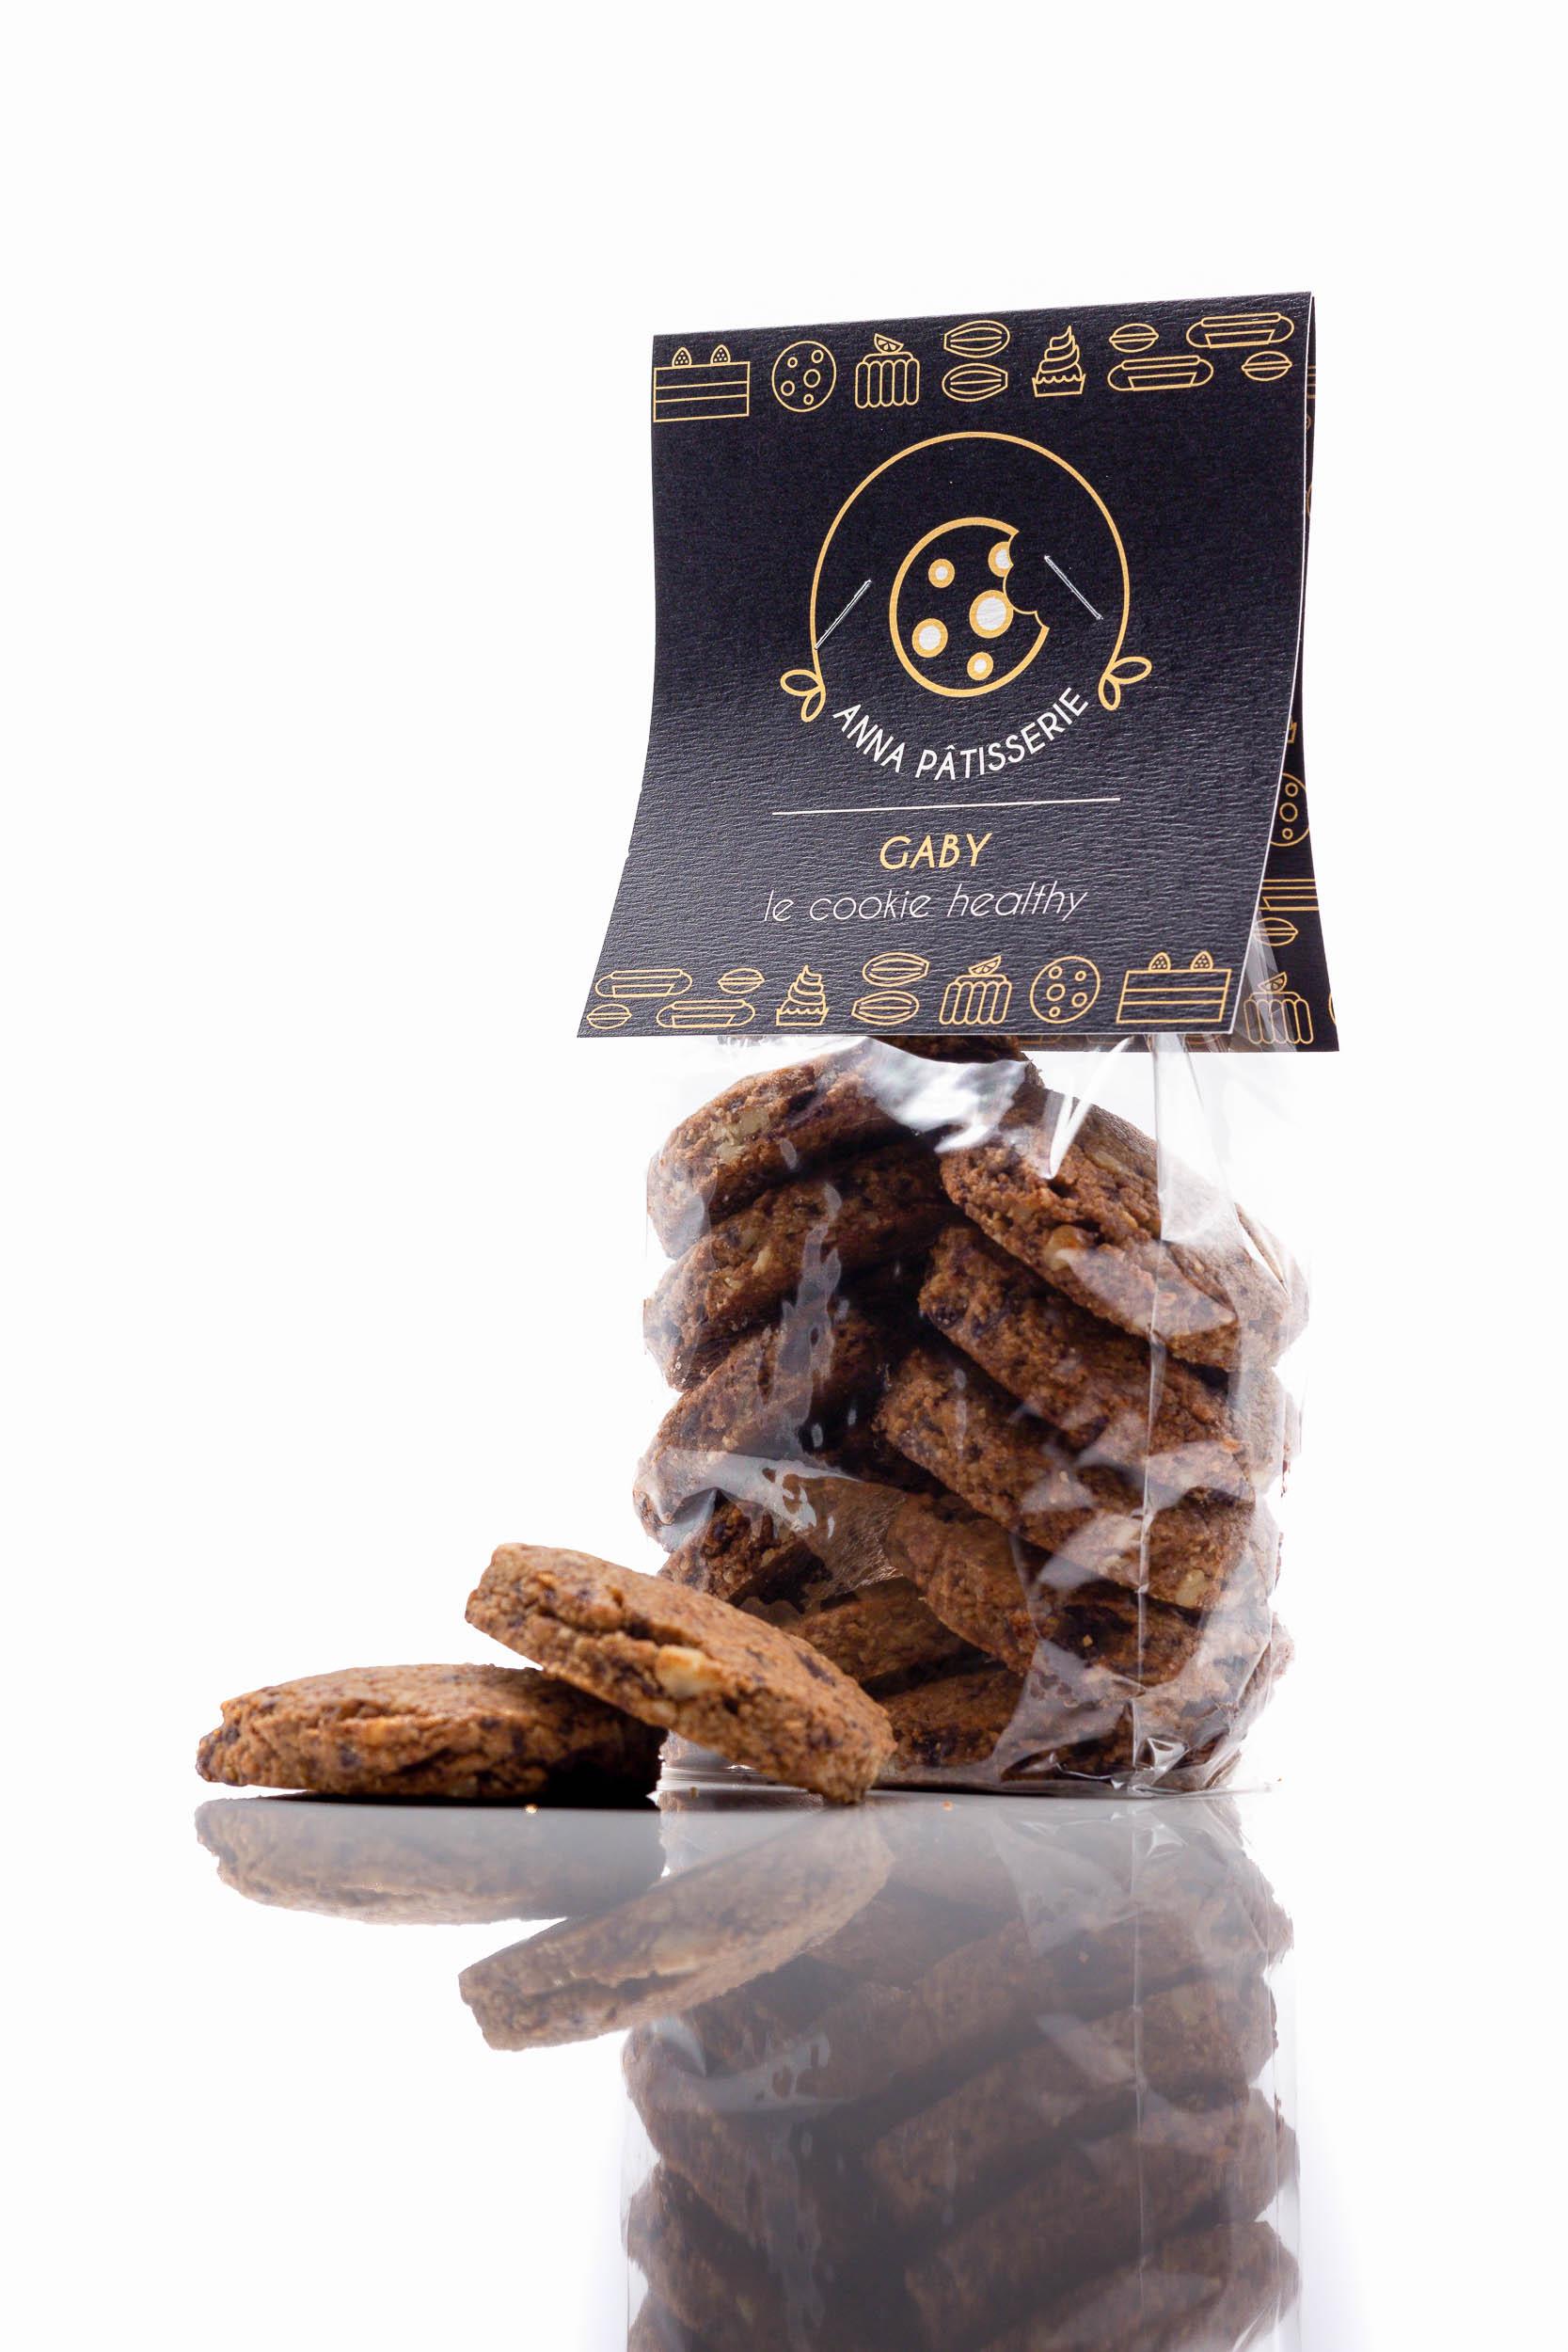 cookie-annapatisserie-photographe-besançon-gui2raw